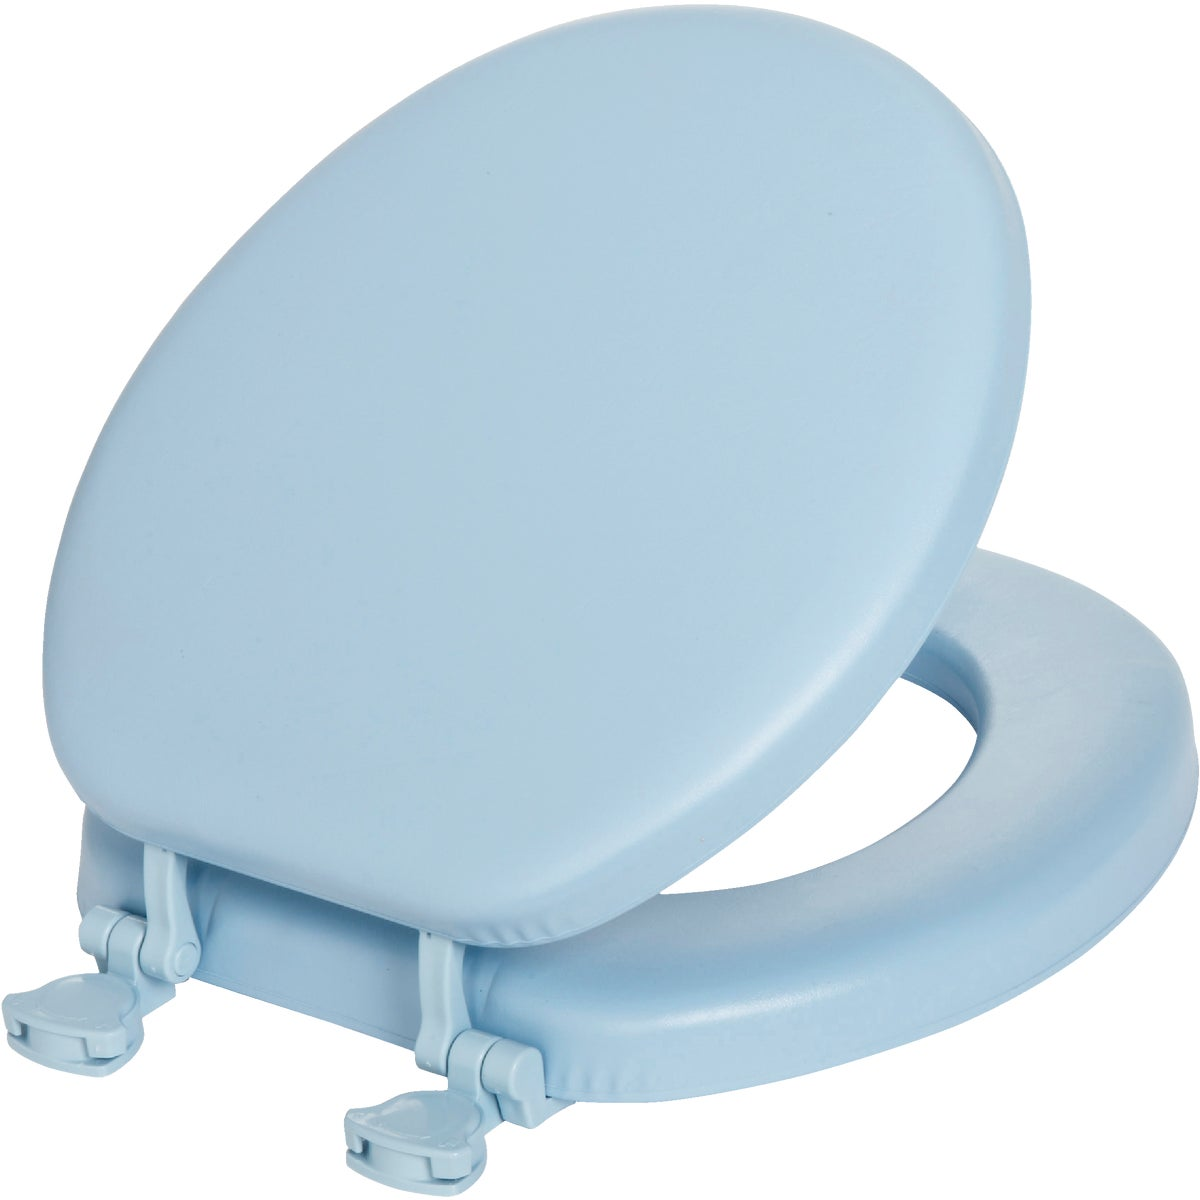 SKY BLUE SOFT ROUND SEAT